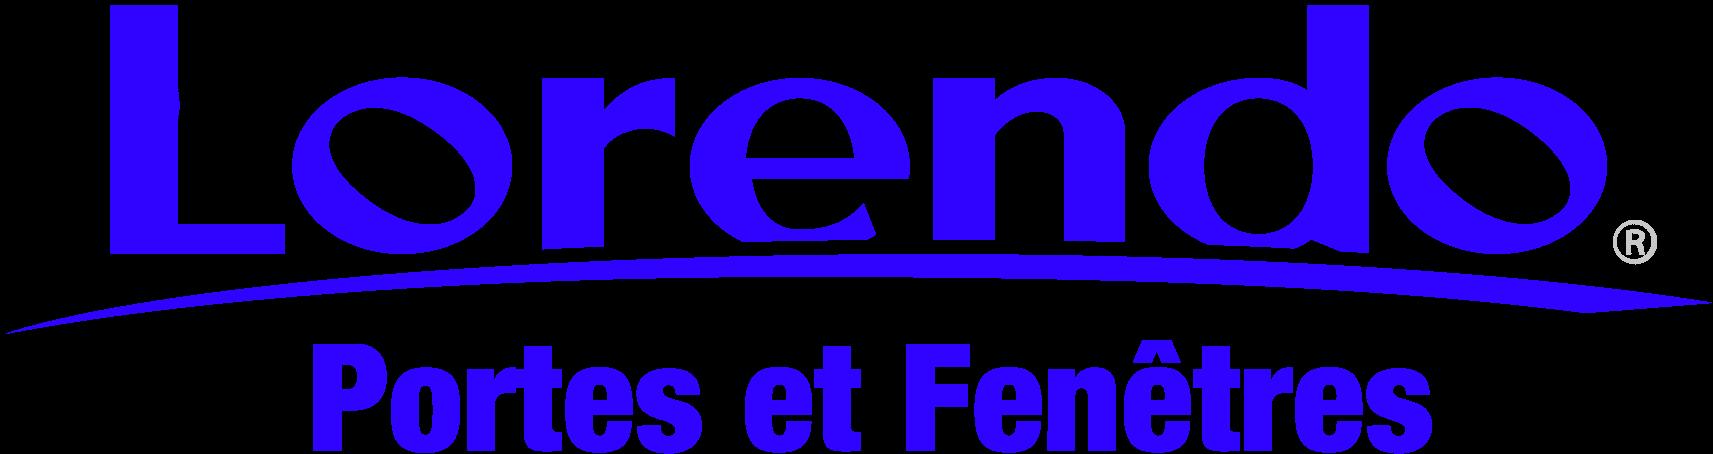 Logo-Lorendo